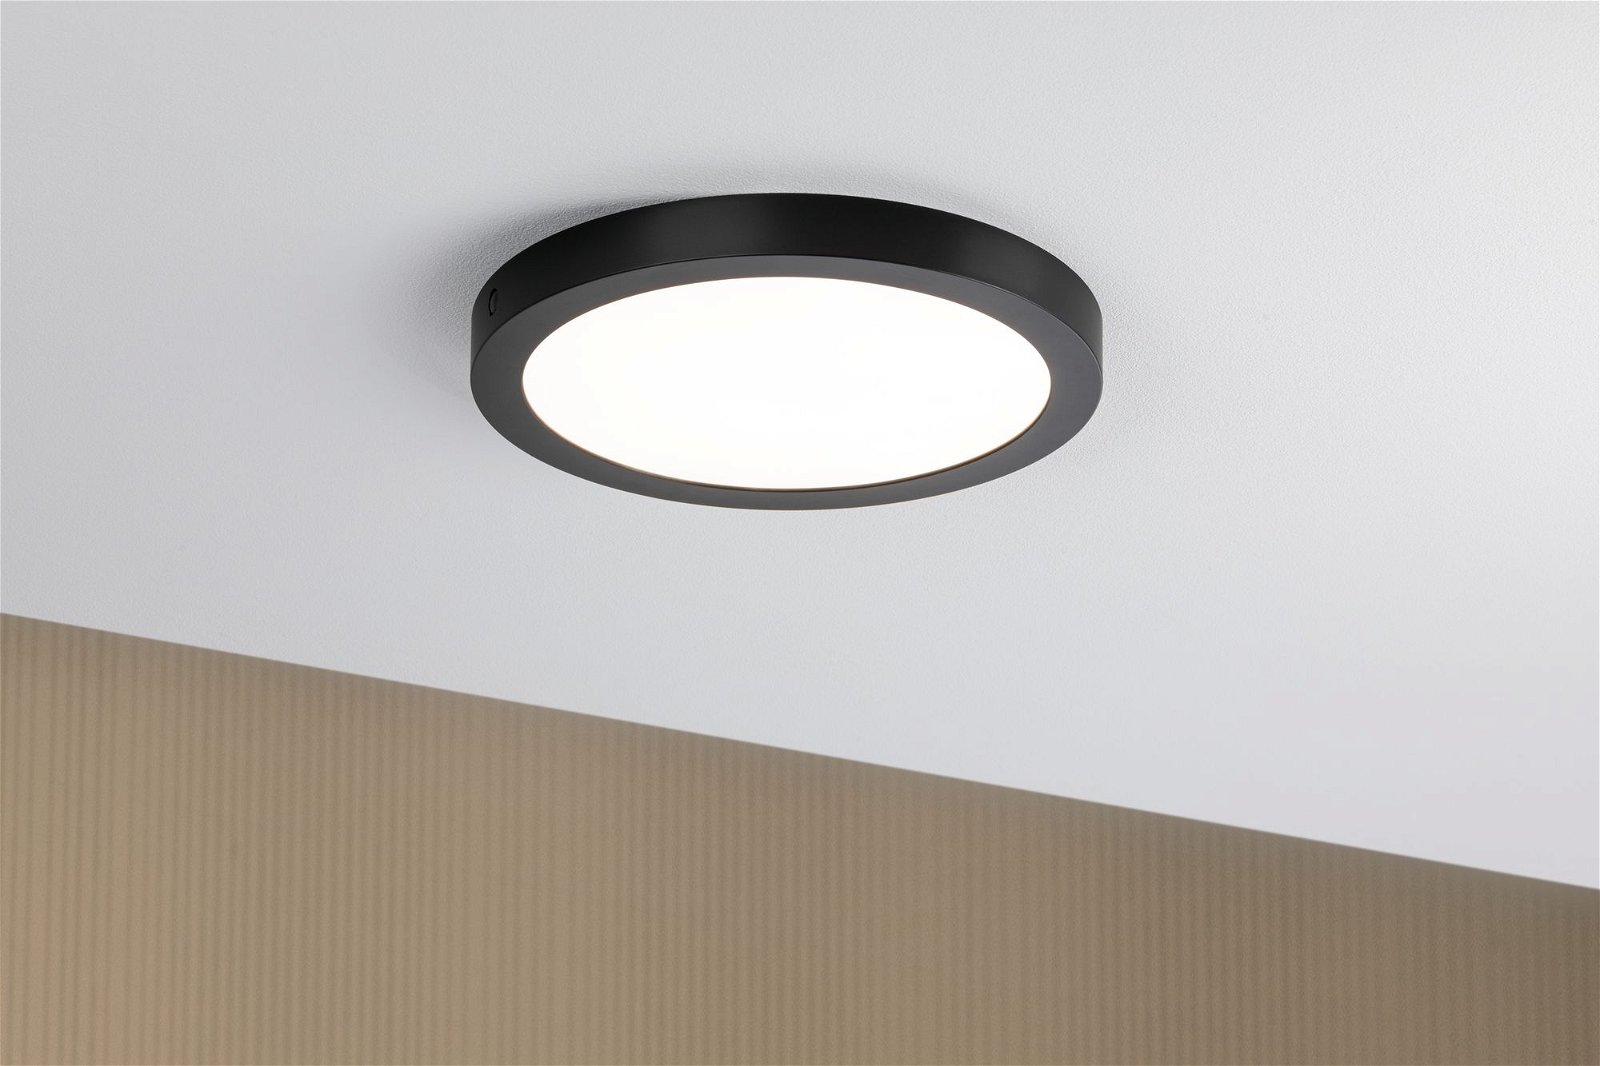 LED Panel Abia round 300mm 2700K Black matt